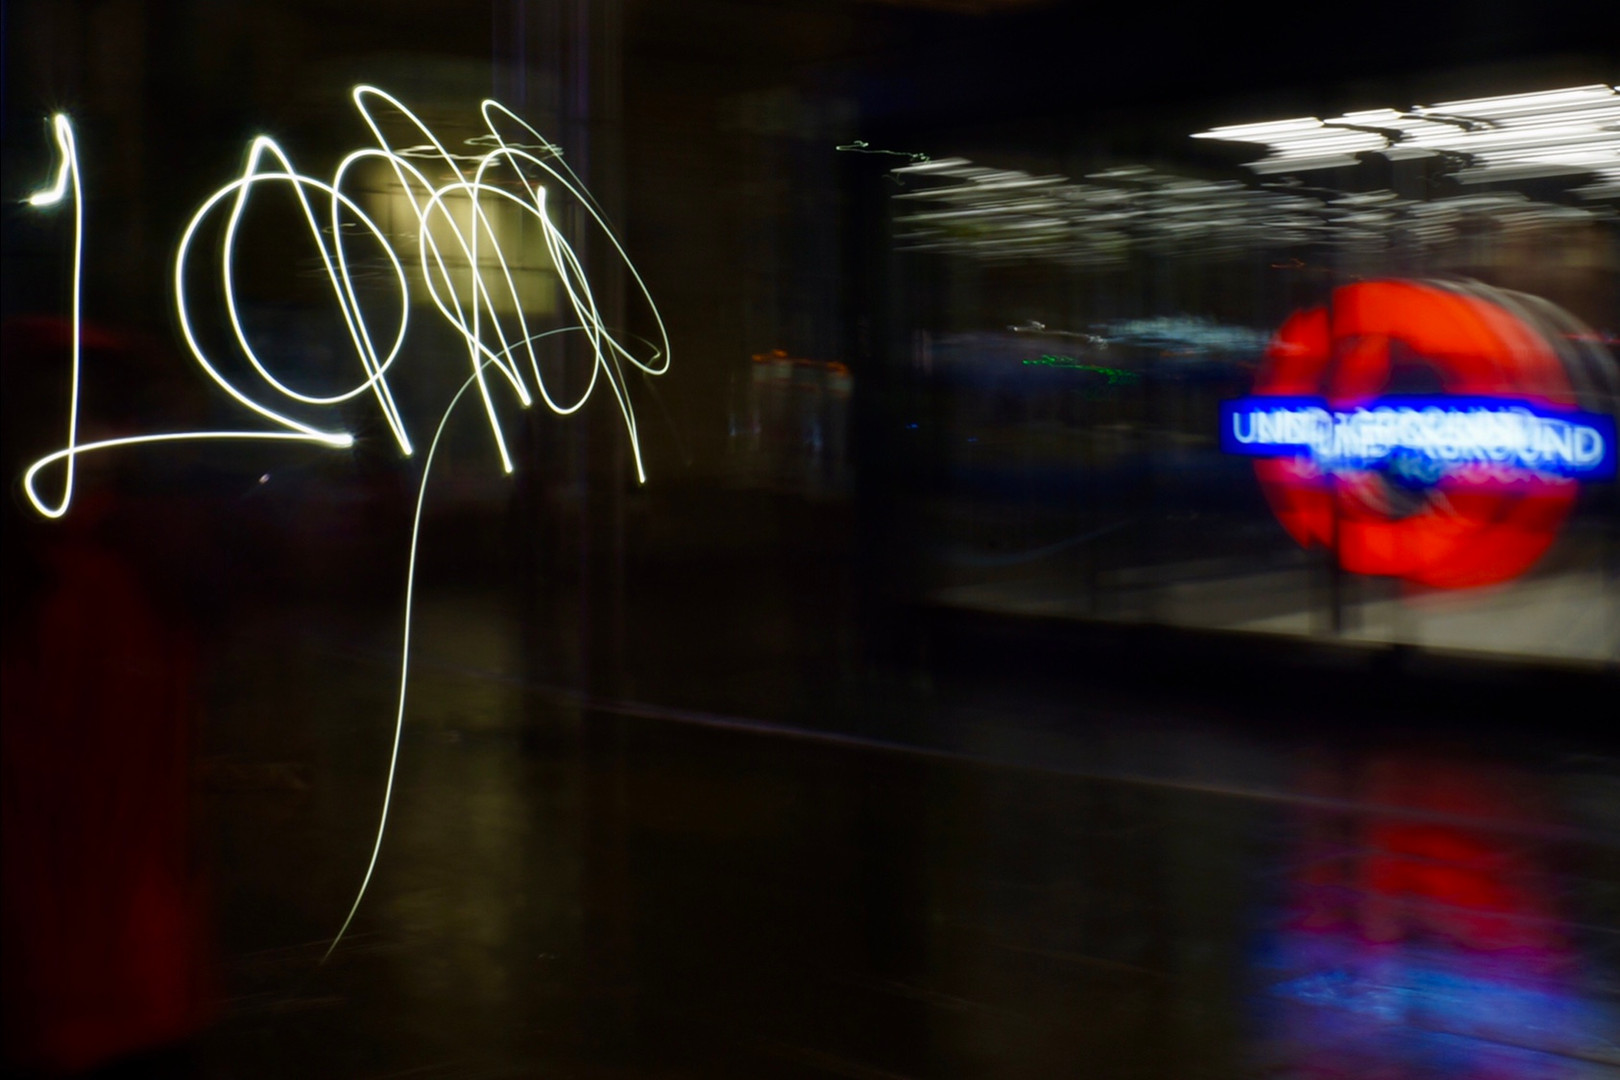 London Light 2